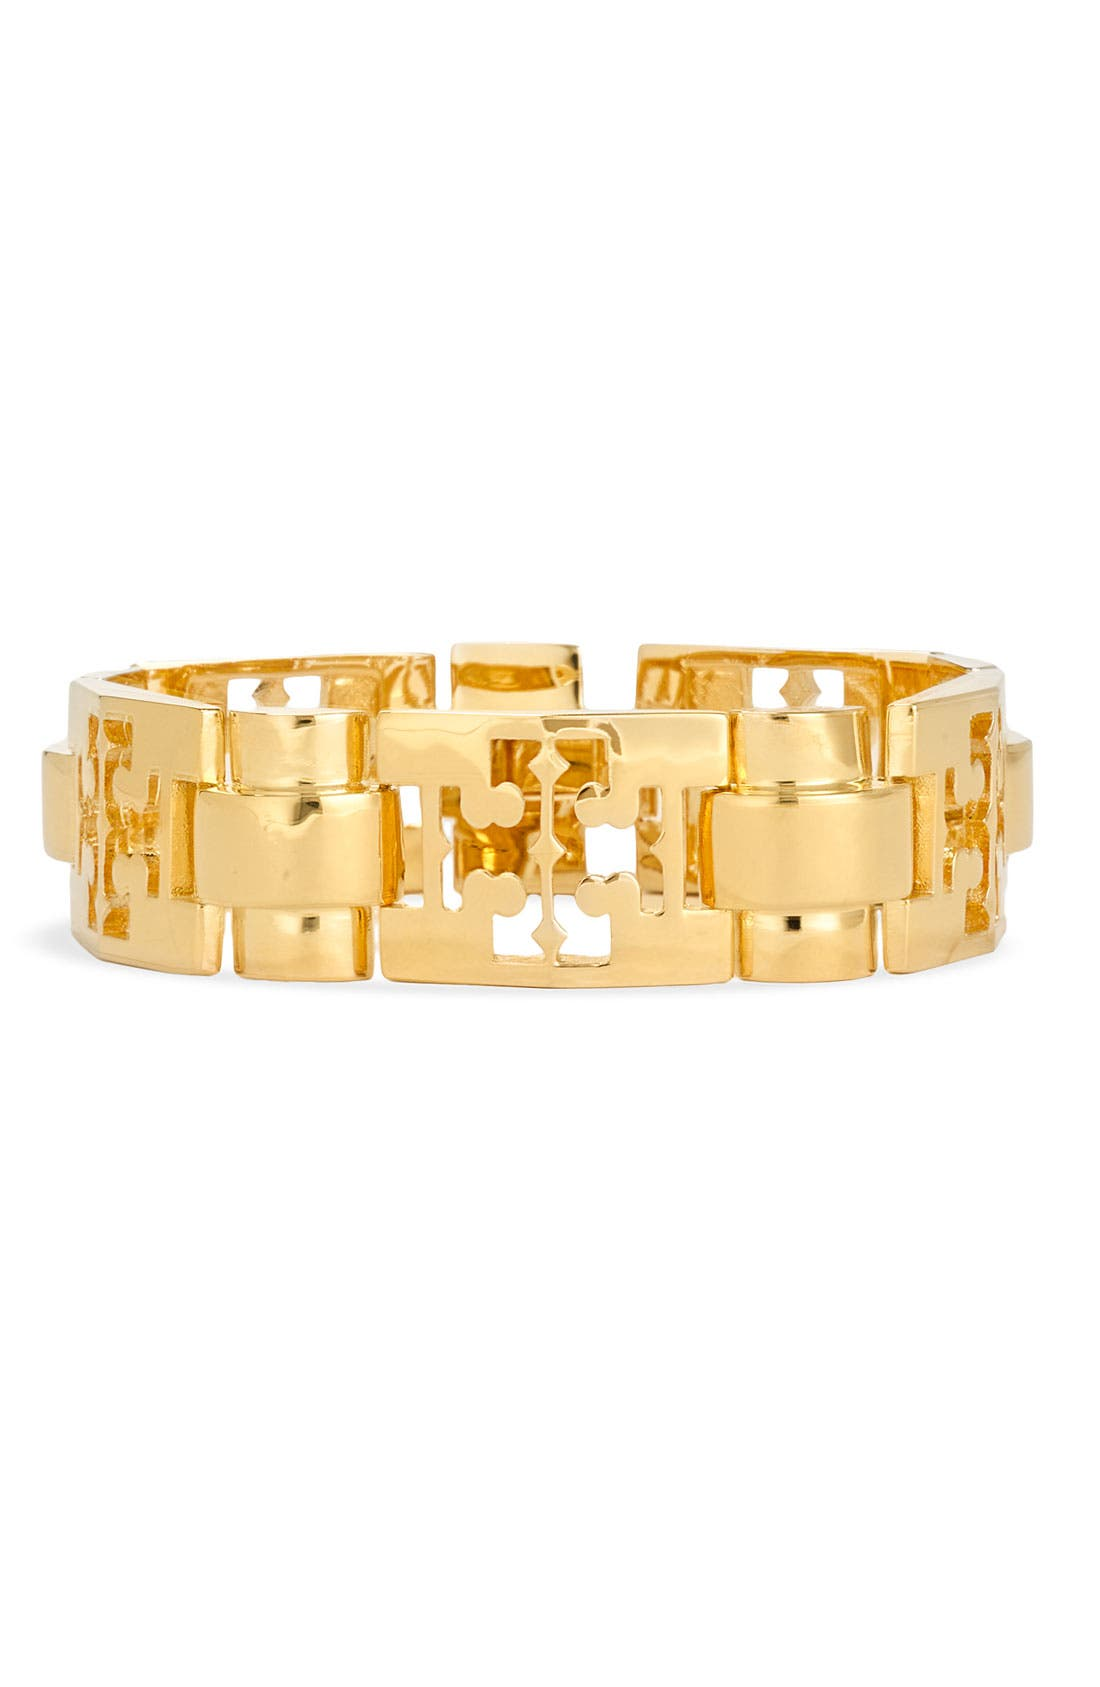 Main Image - Tory Burch Pyramid Bracelet